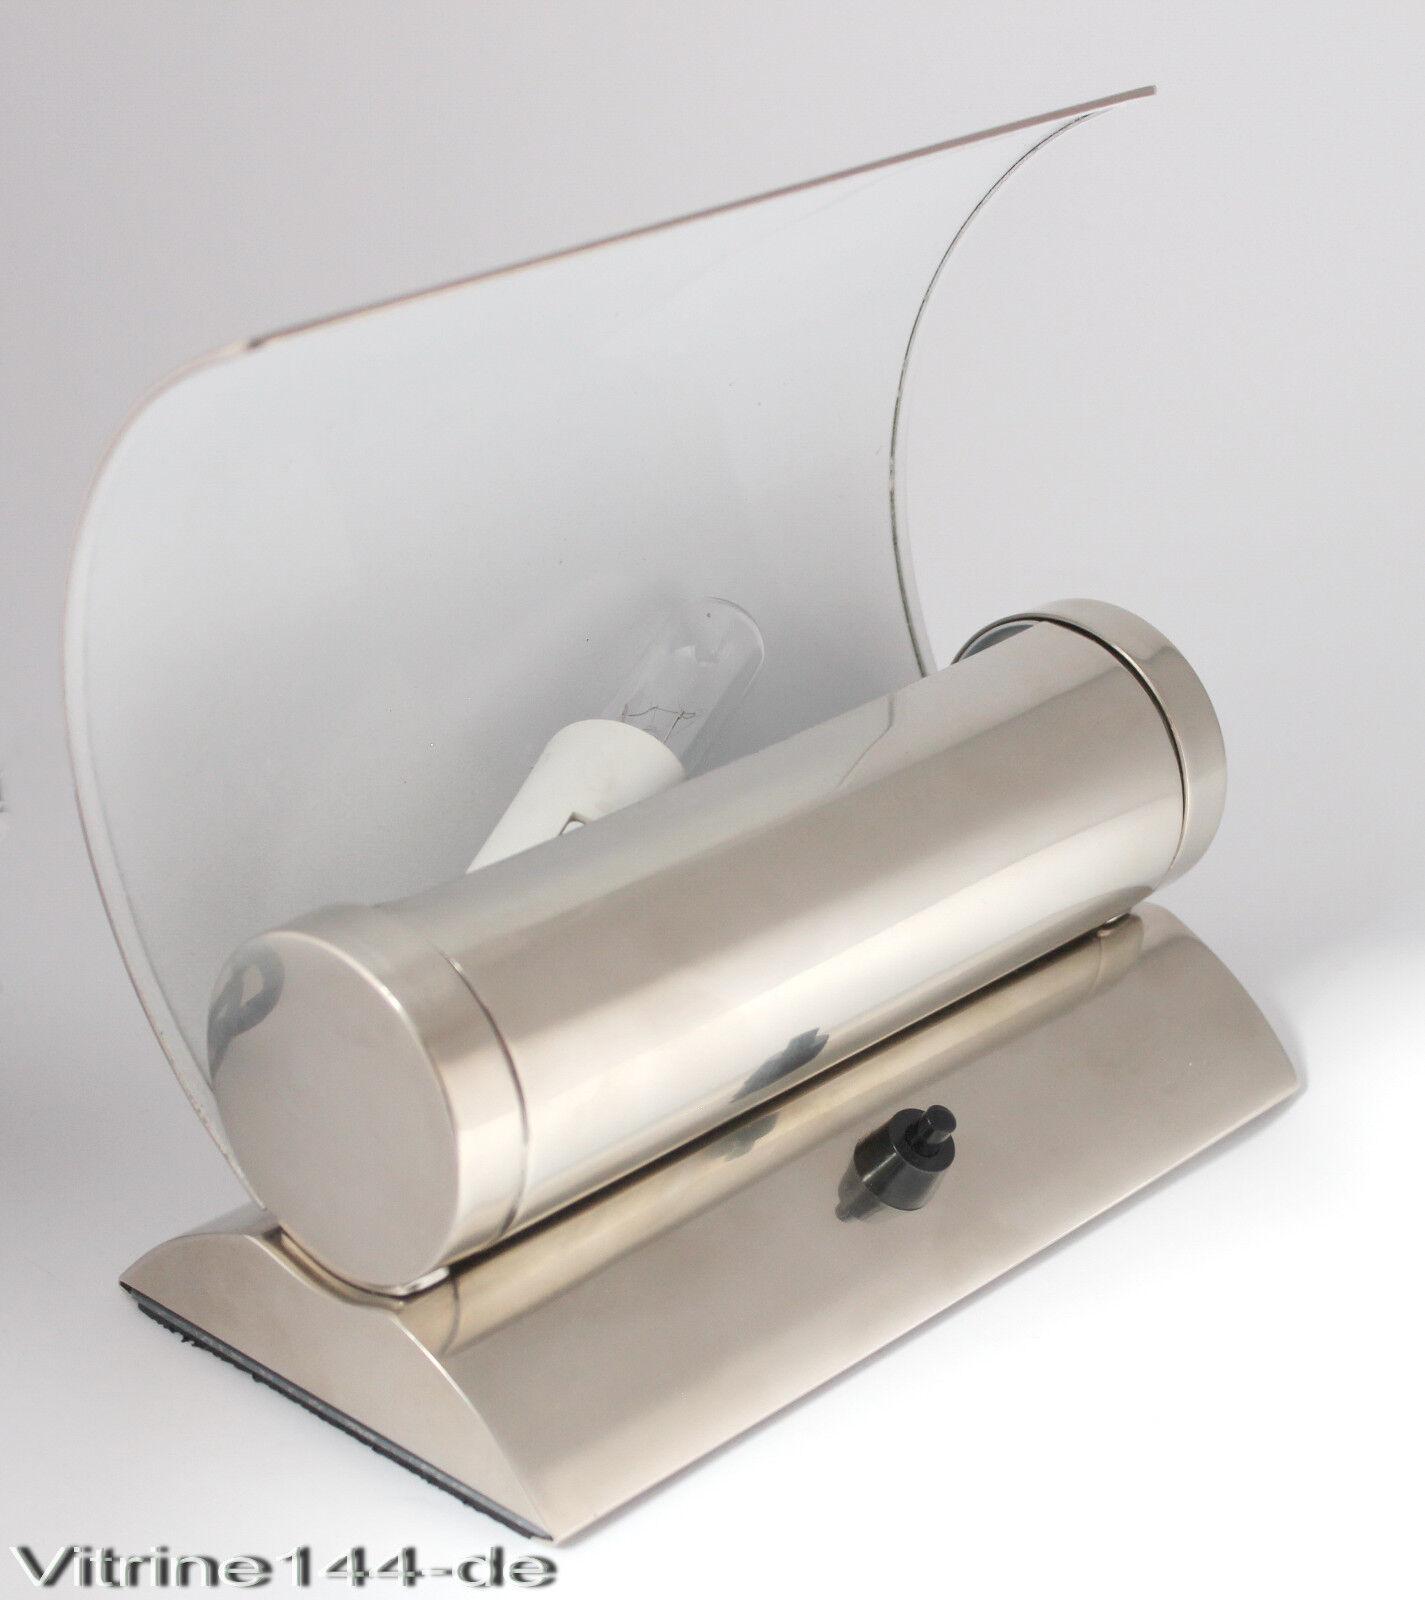 bauhaus design lampe tischleuchte wandleuchte silber matt messing vernickelt eur 170 00. Black Bedroom Furniture Sets. Home Design Ideas